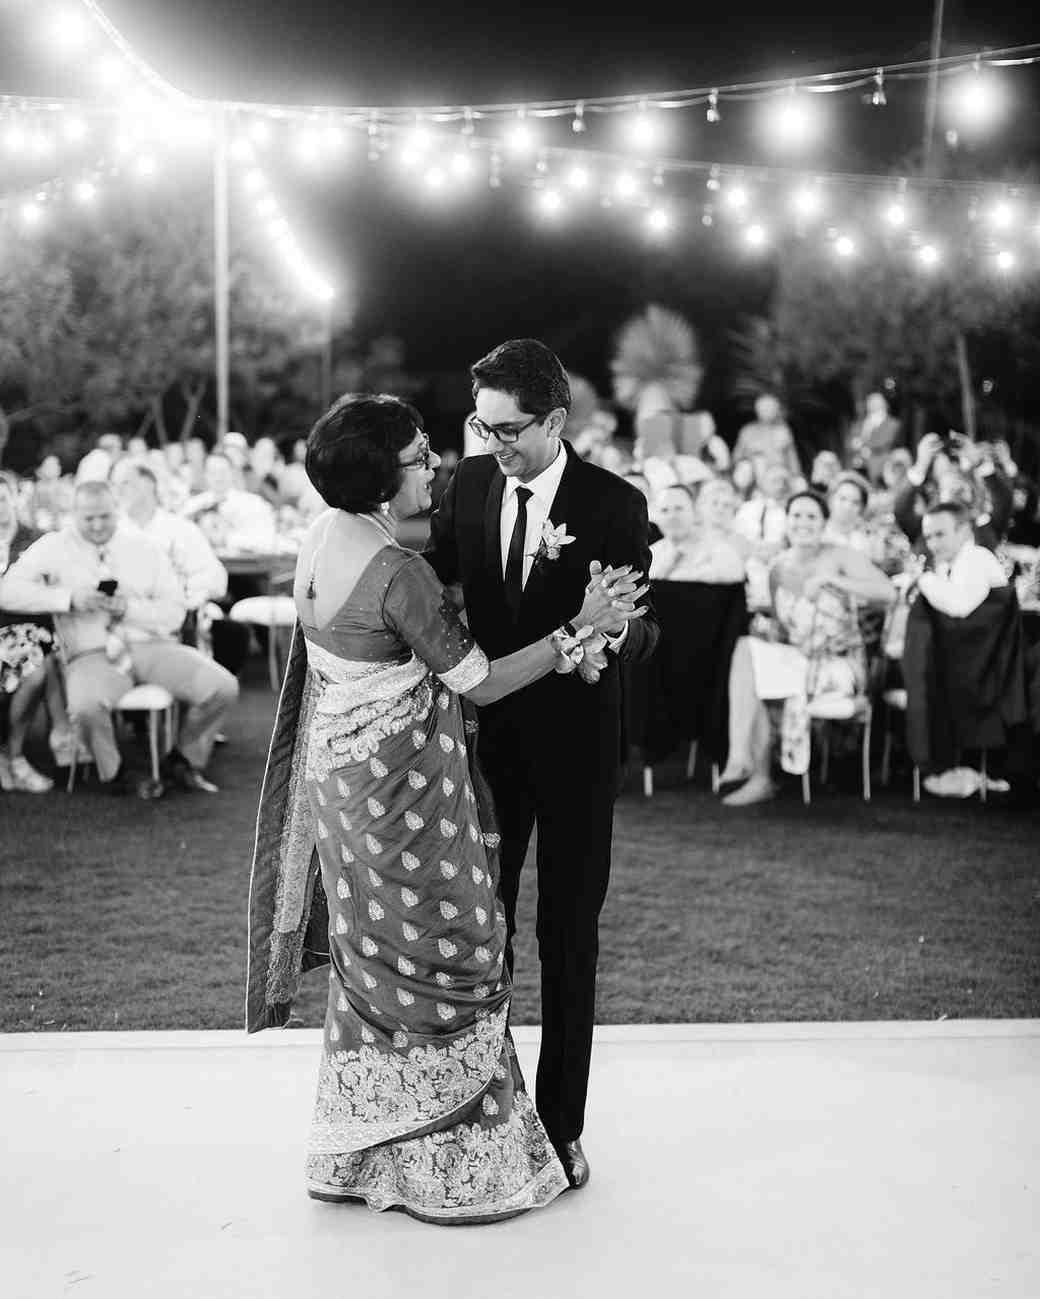 emily adhir wedding dancing mother son dance